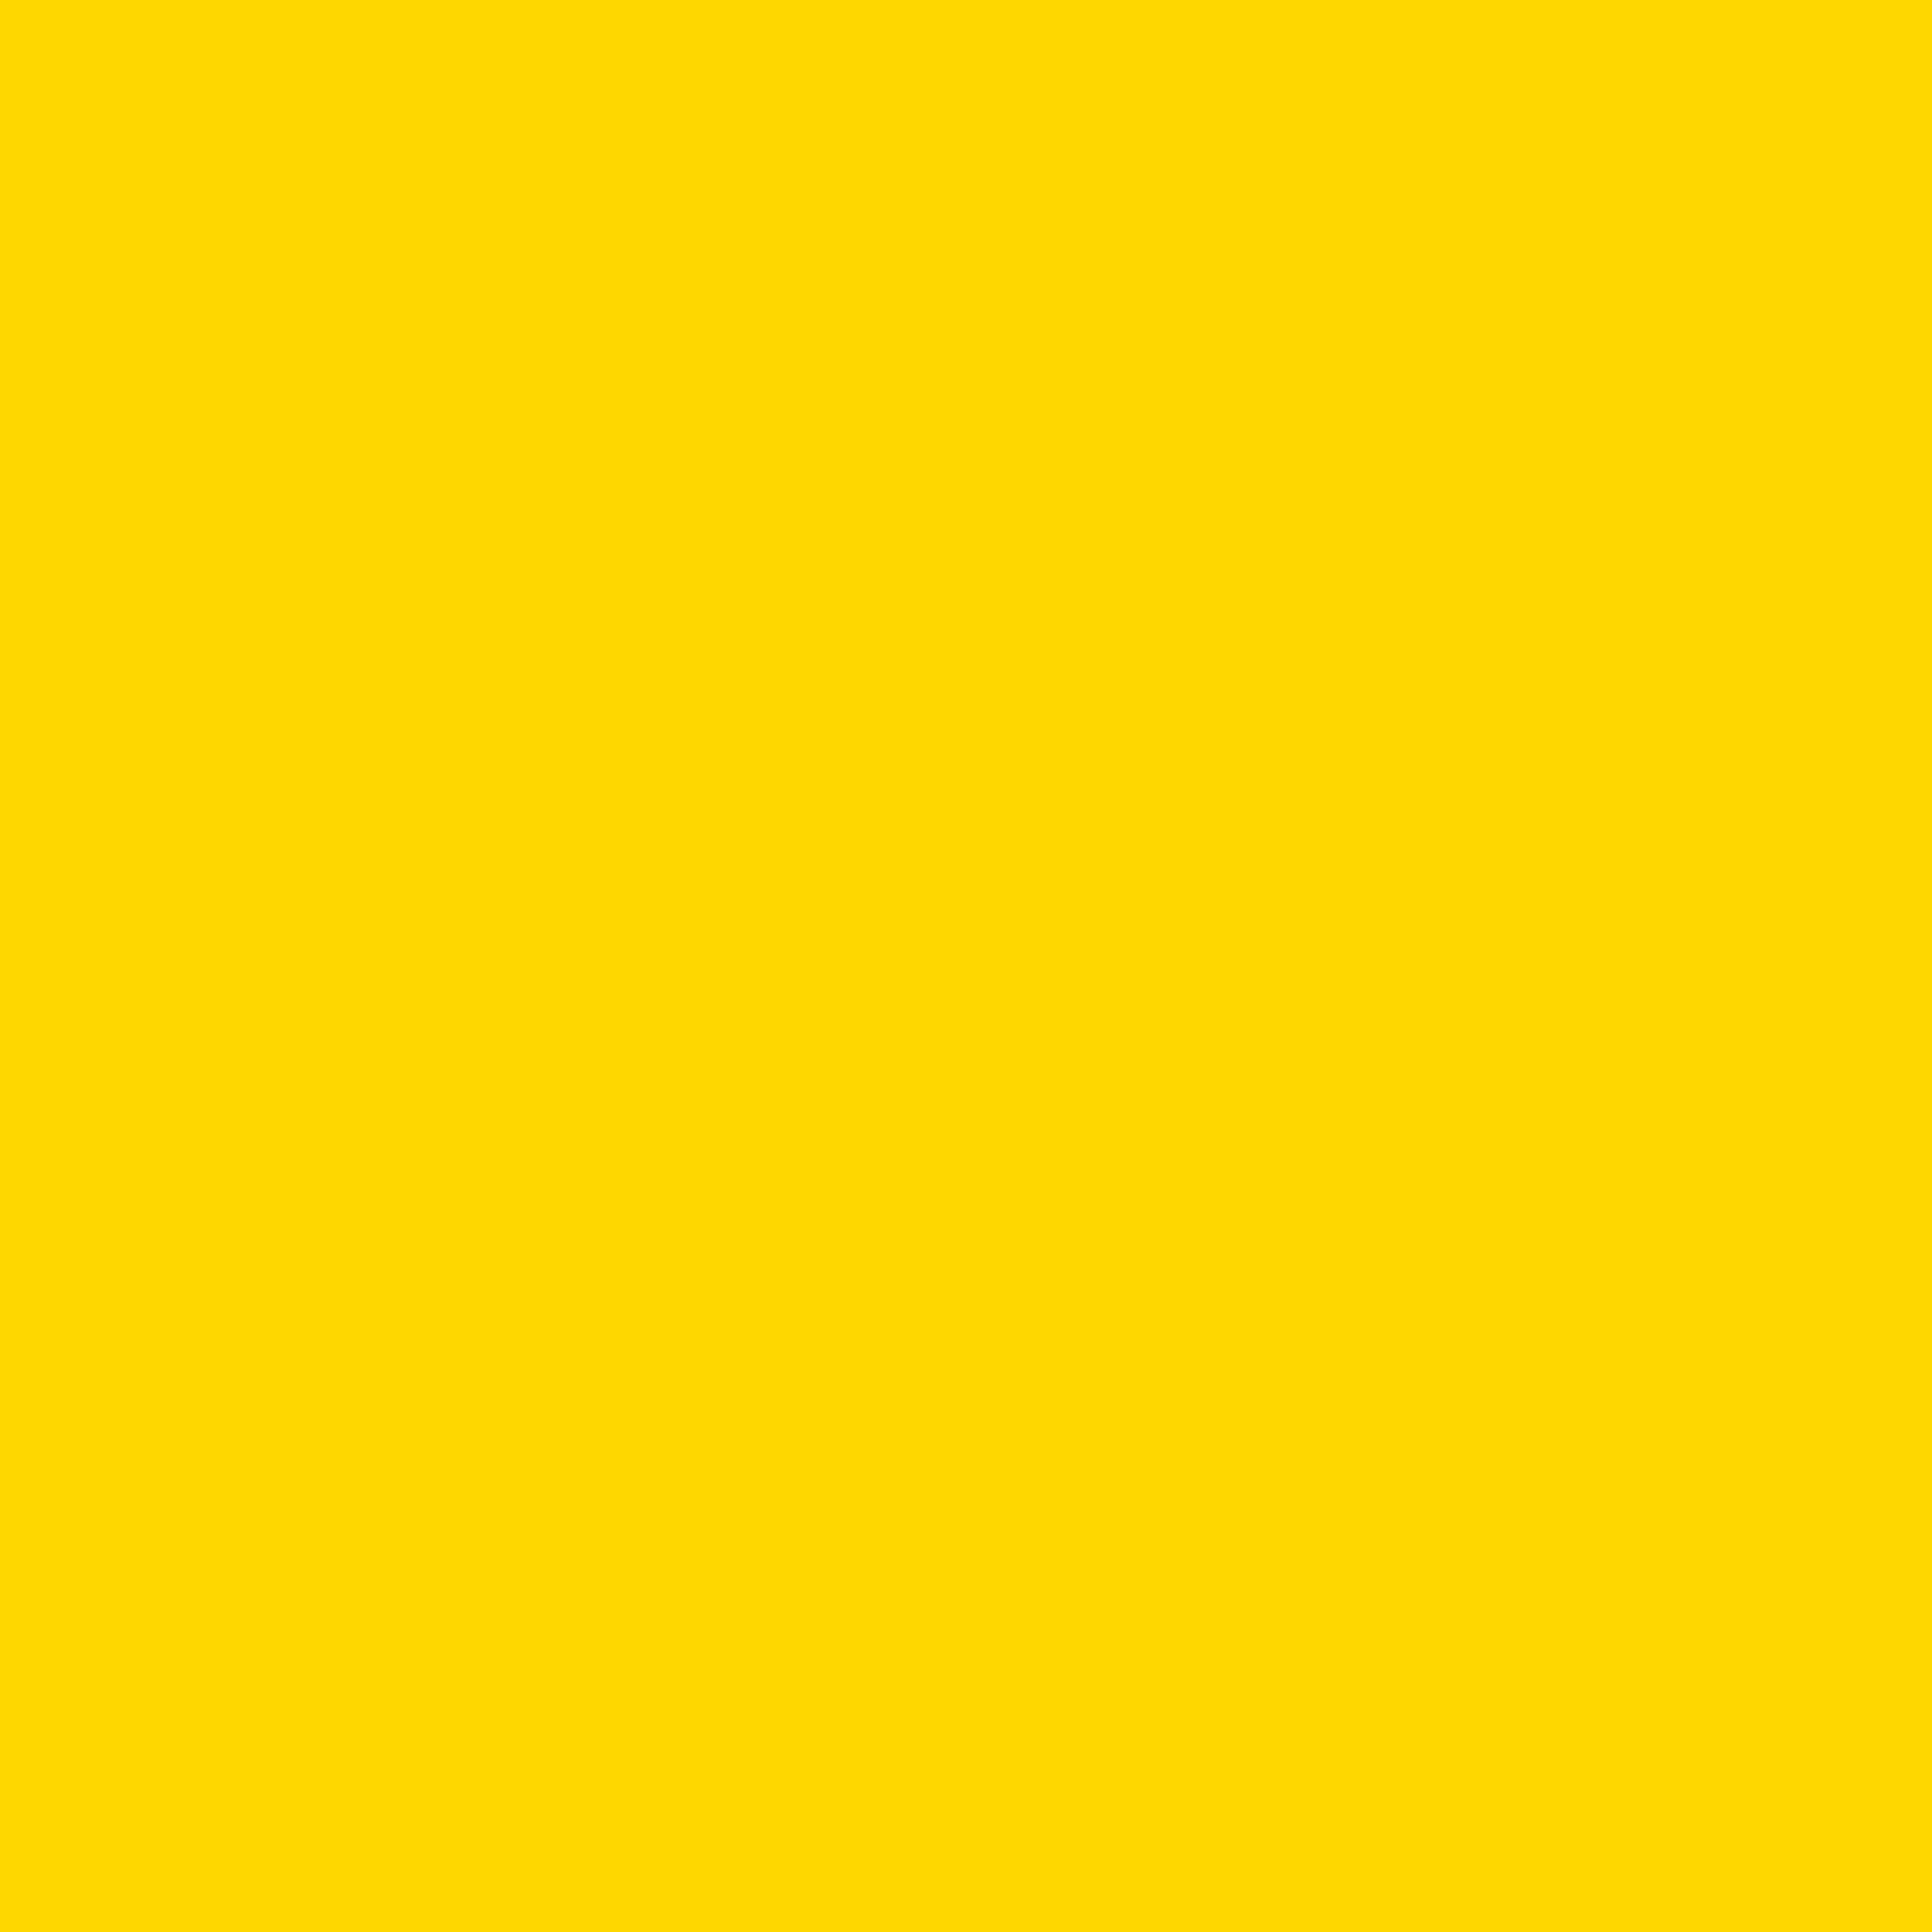 2048x2048 Gold Web Golden Solid Color Background